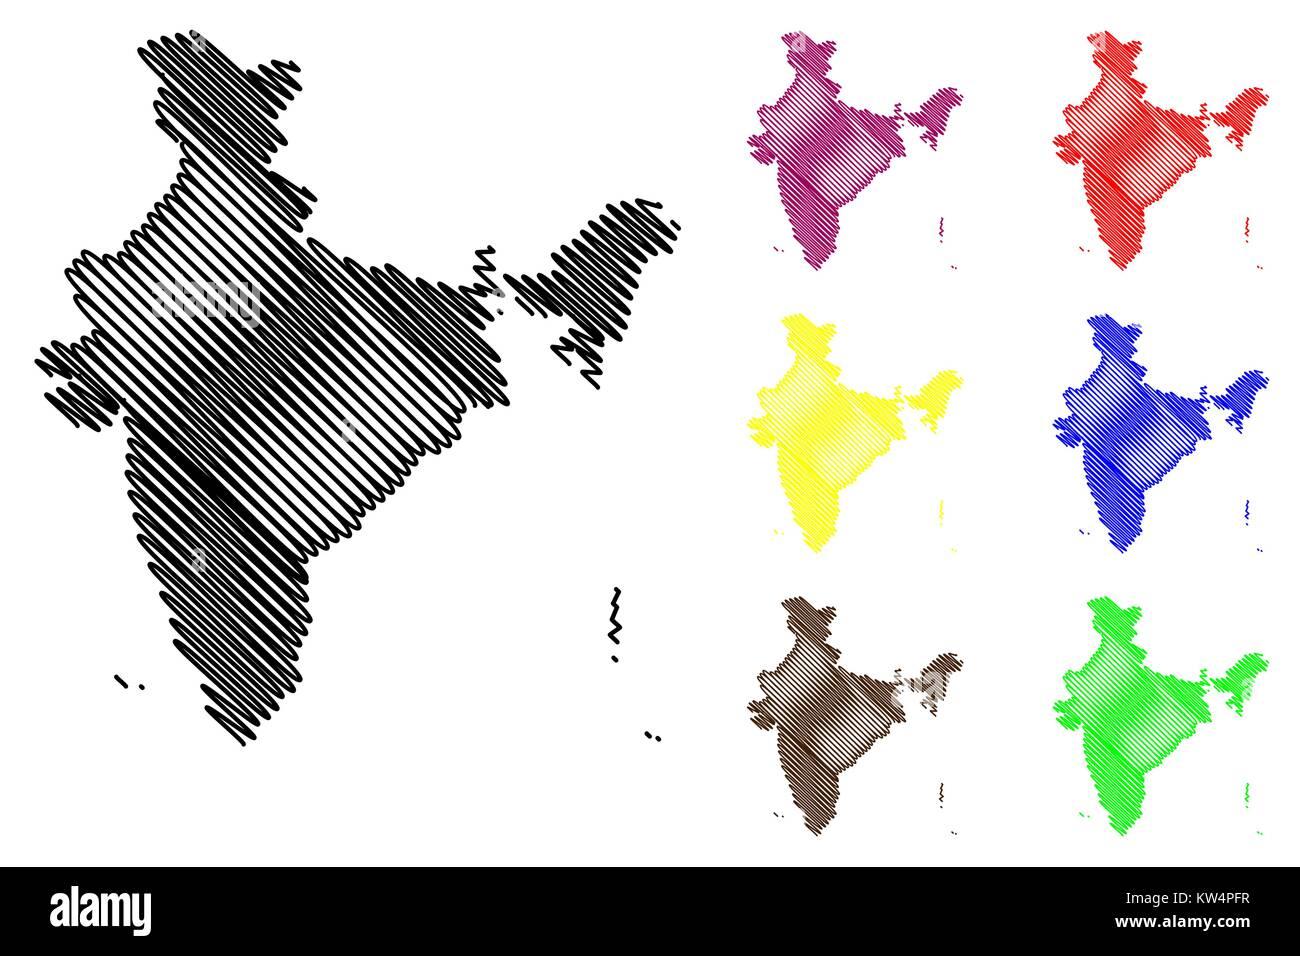 India map vector illustration, scribble sketch Republic of India Stock Vector